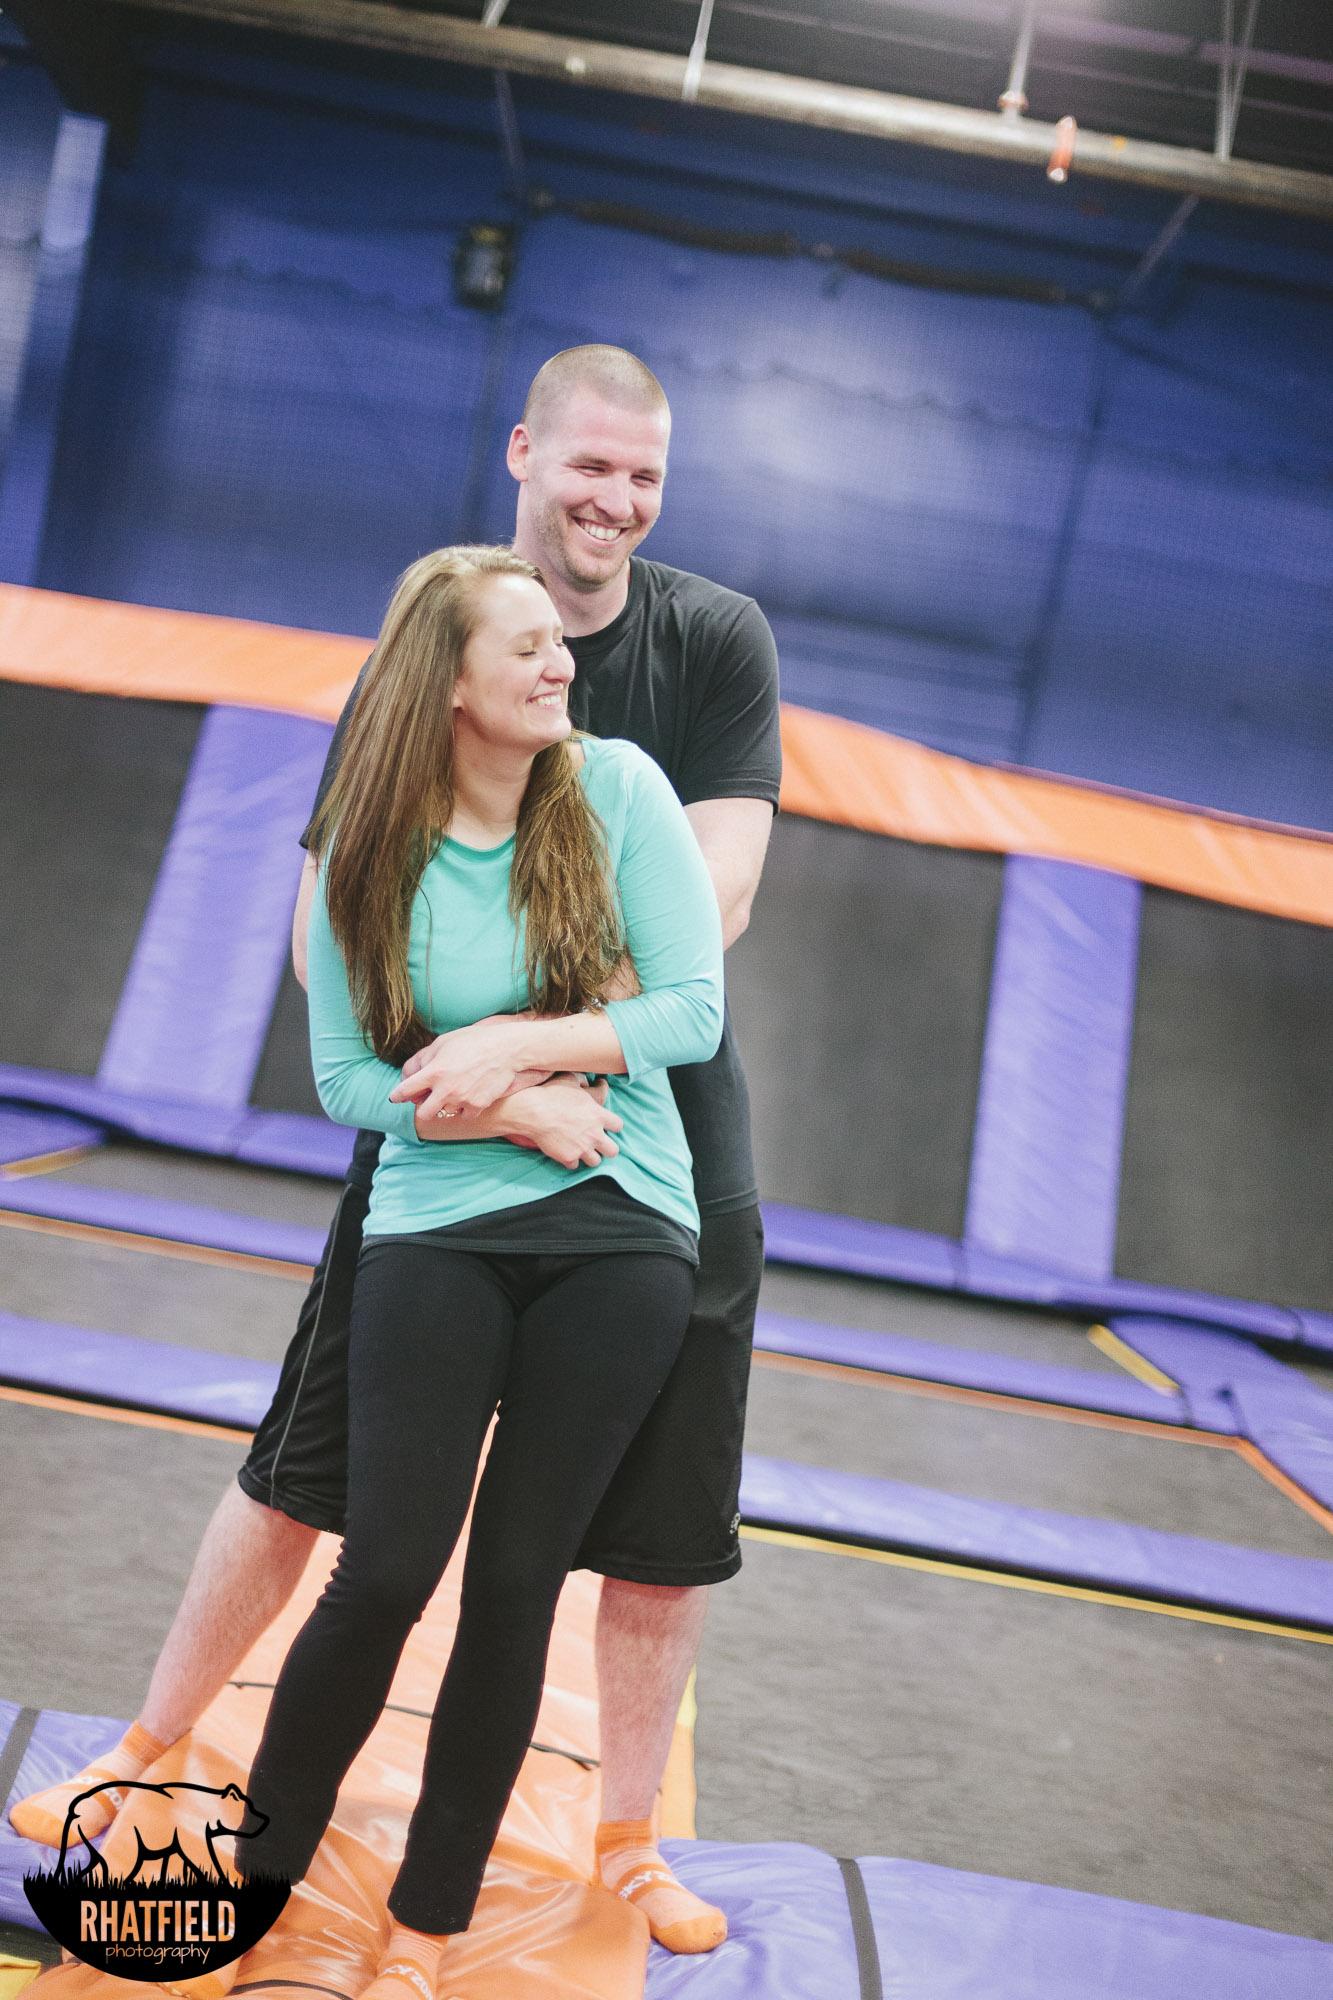 tickle-trampoline-skyzone-couple